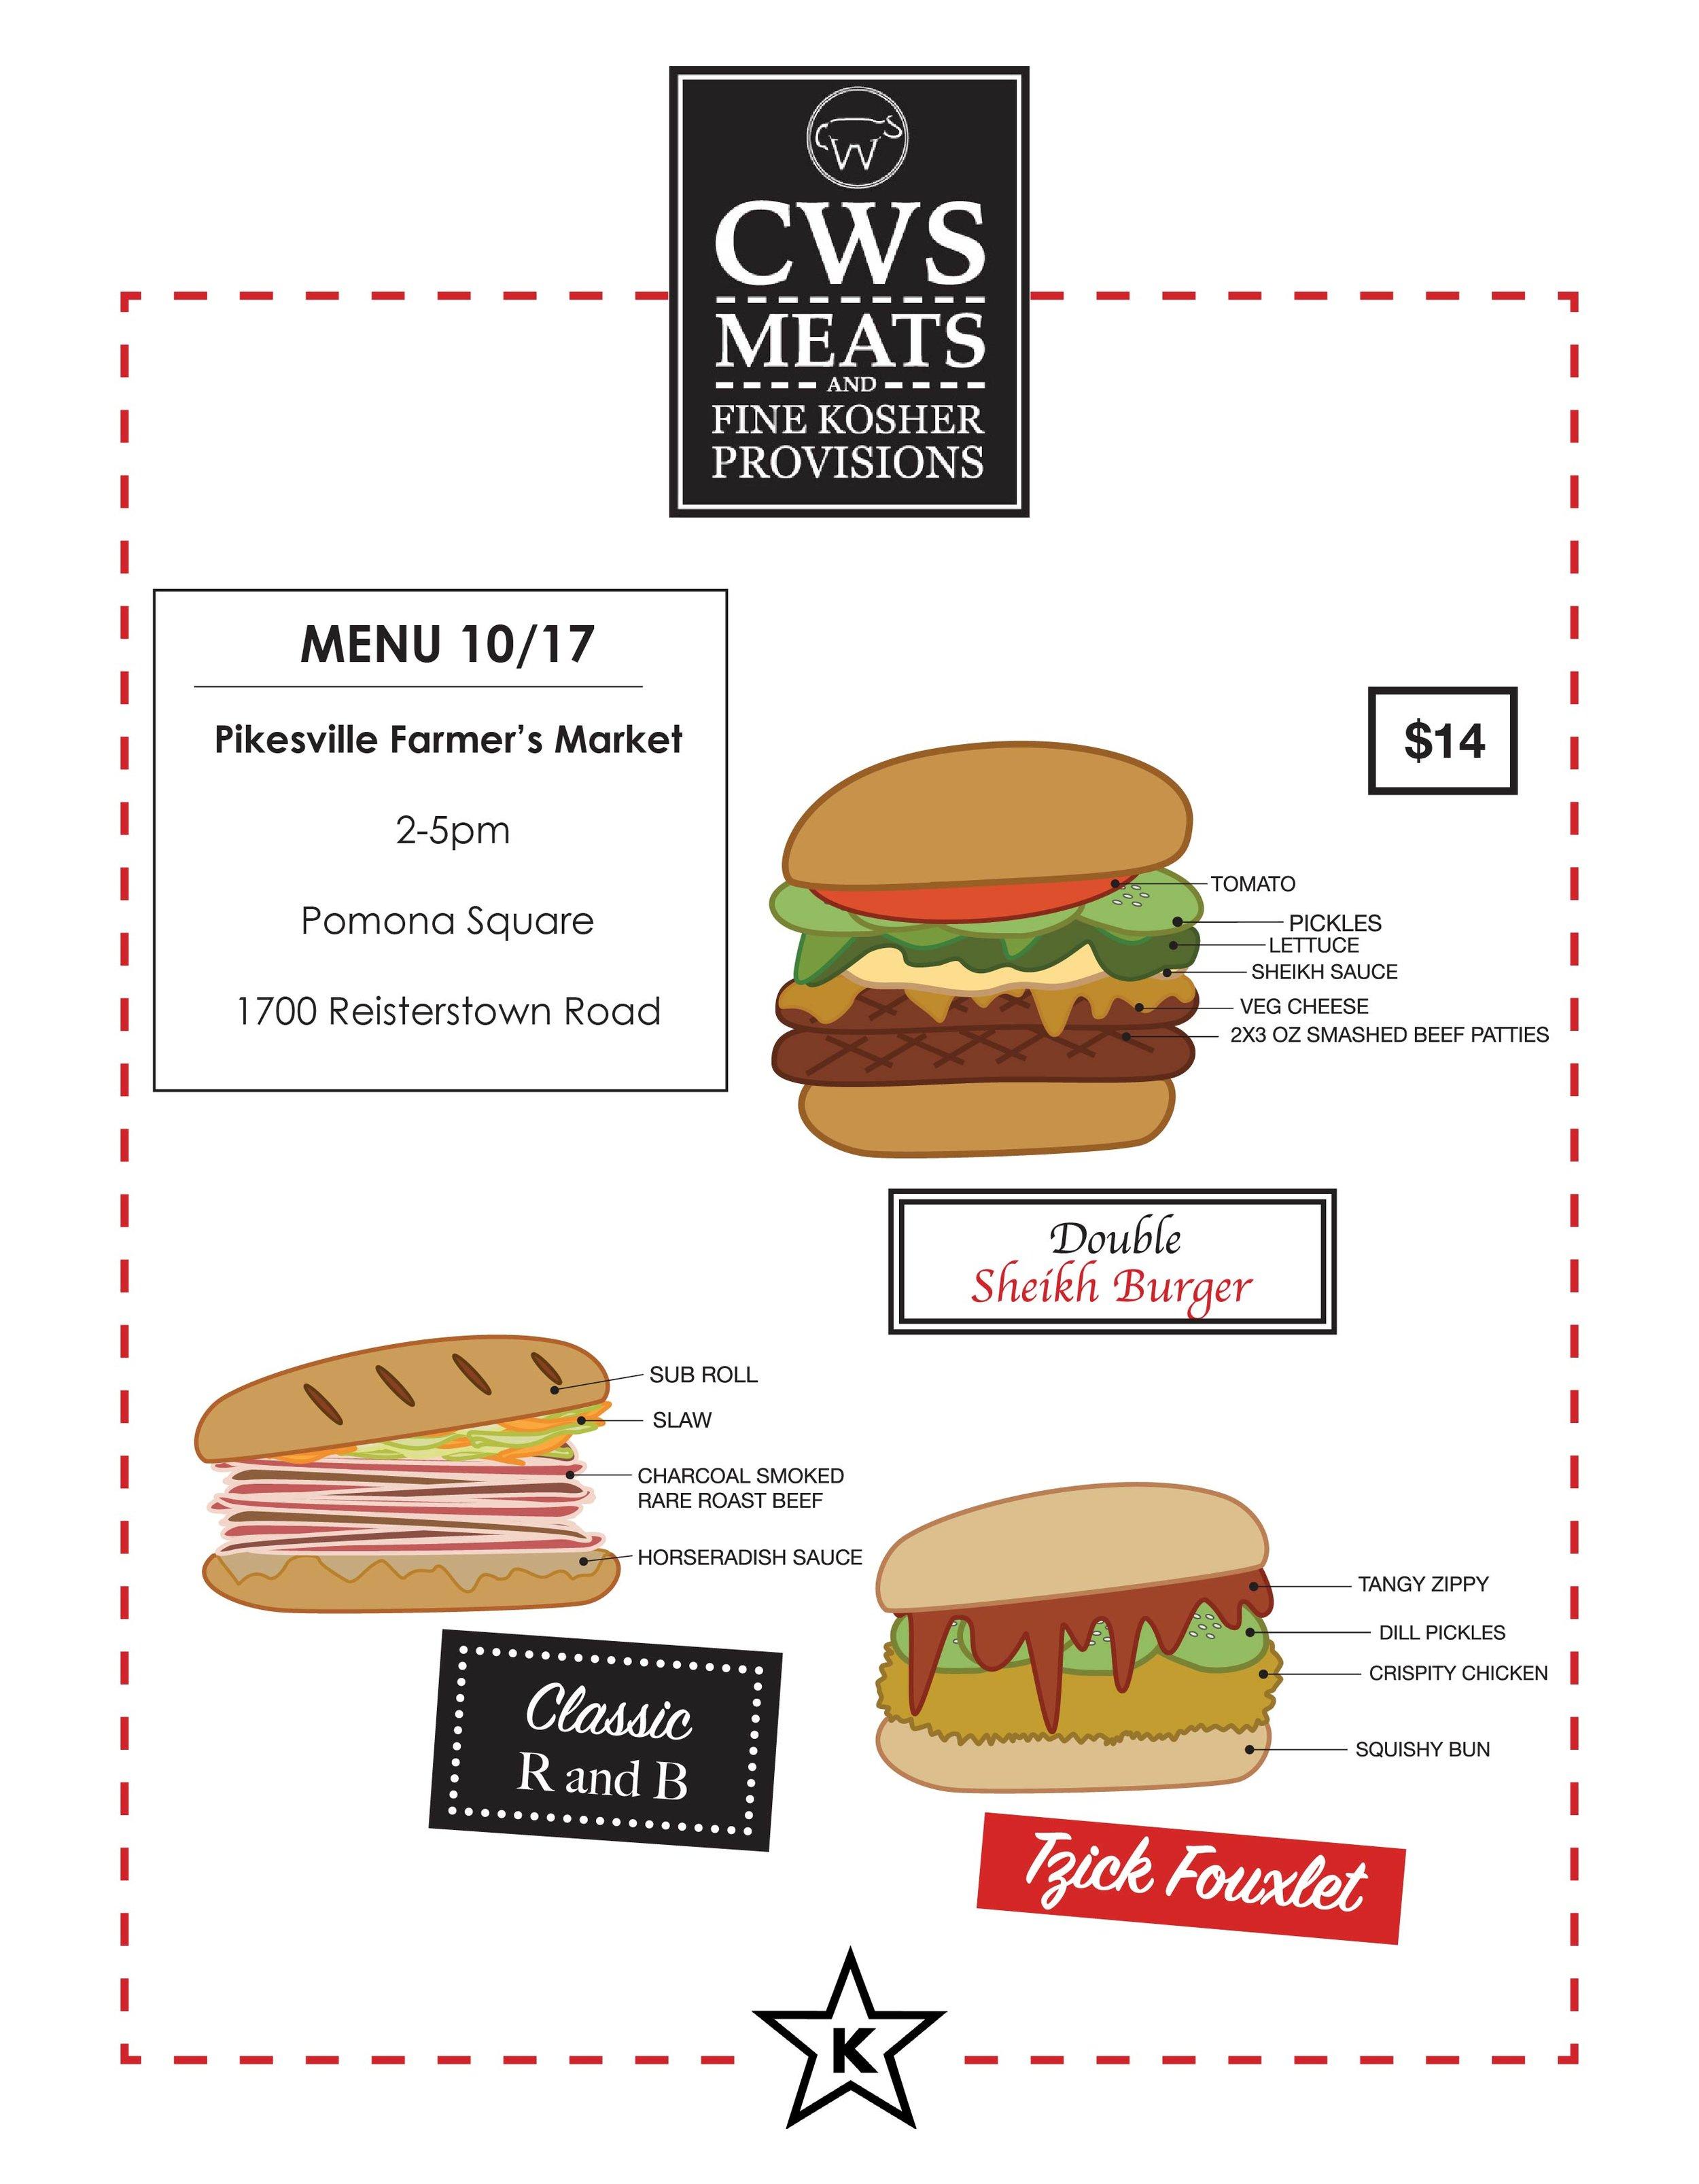 pikesville menu 10-17.jpg